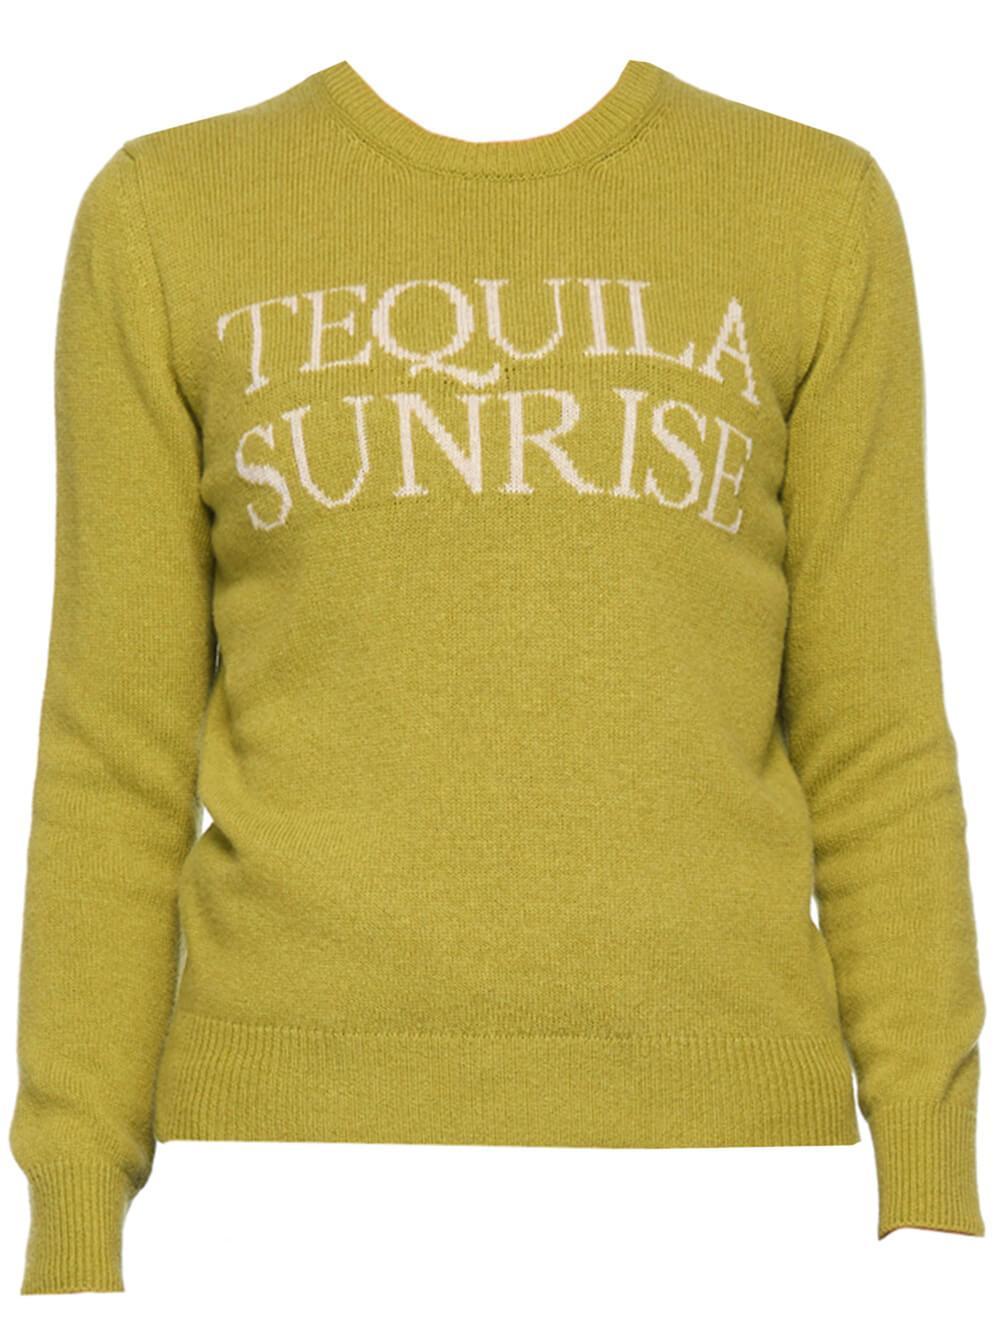 Tequila Sunrise Sweater Item # F13587-01381-TEQ